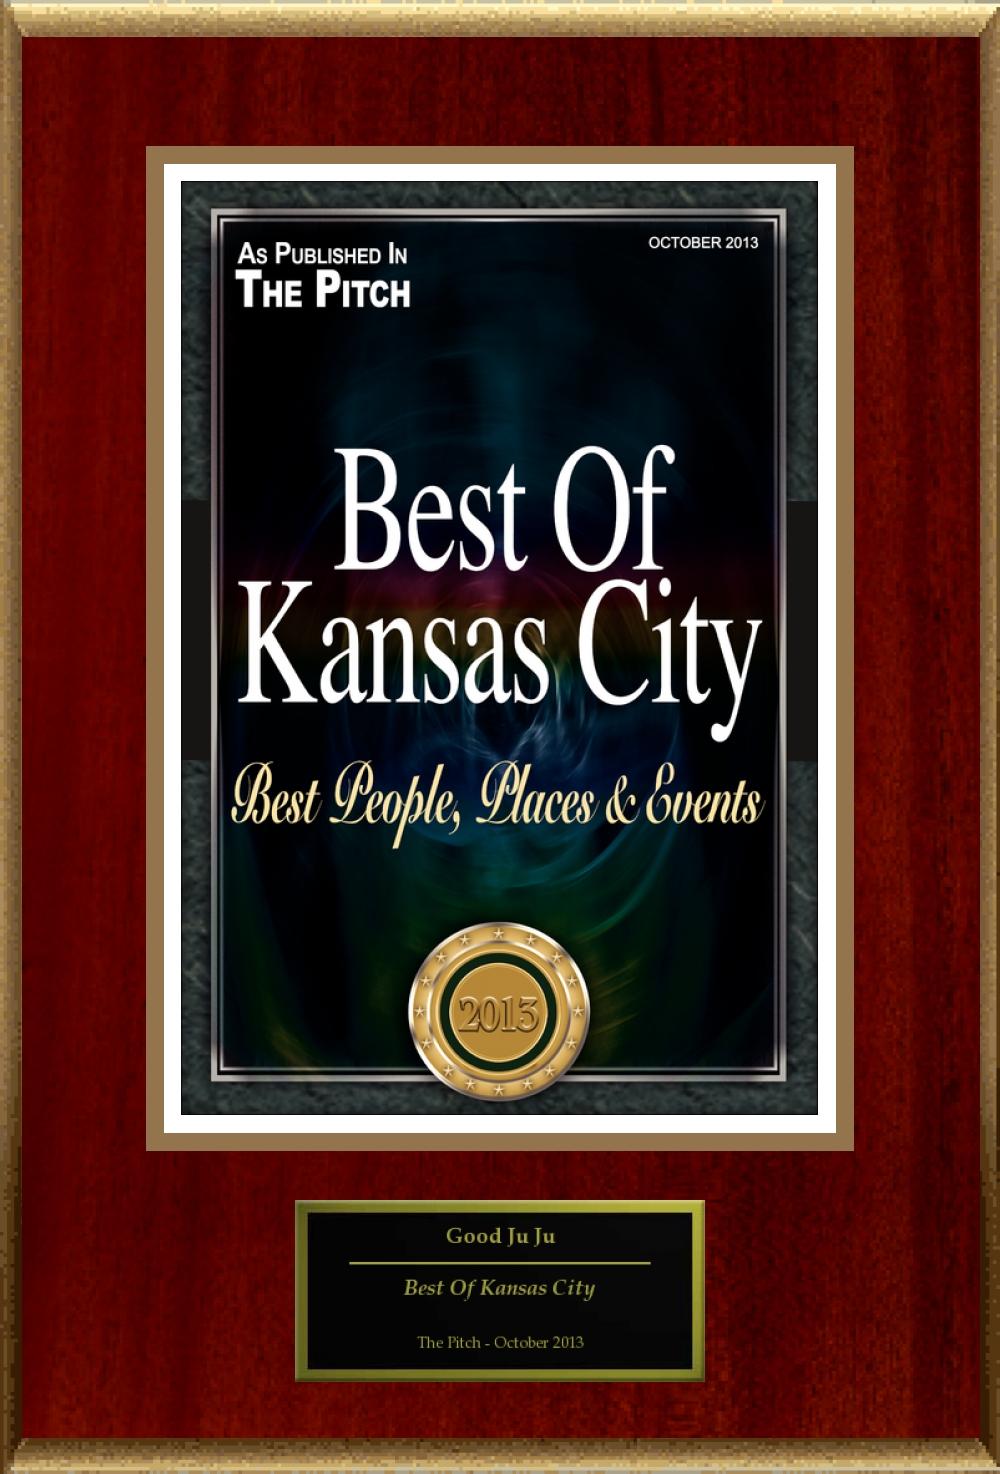 The Pitch Magazine City's Best Award 2013